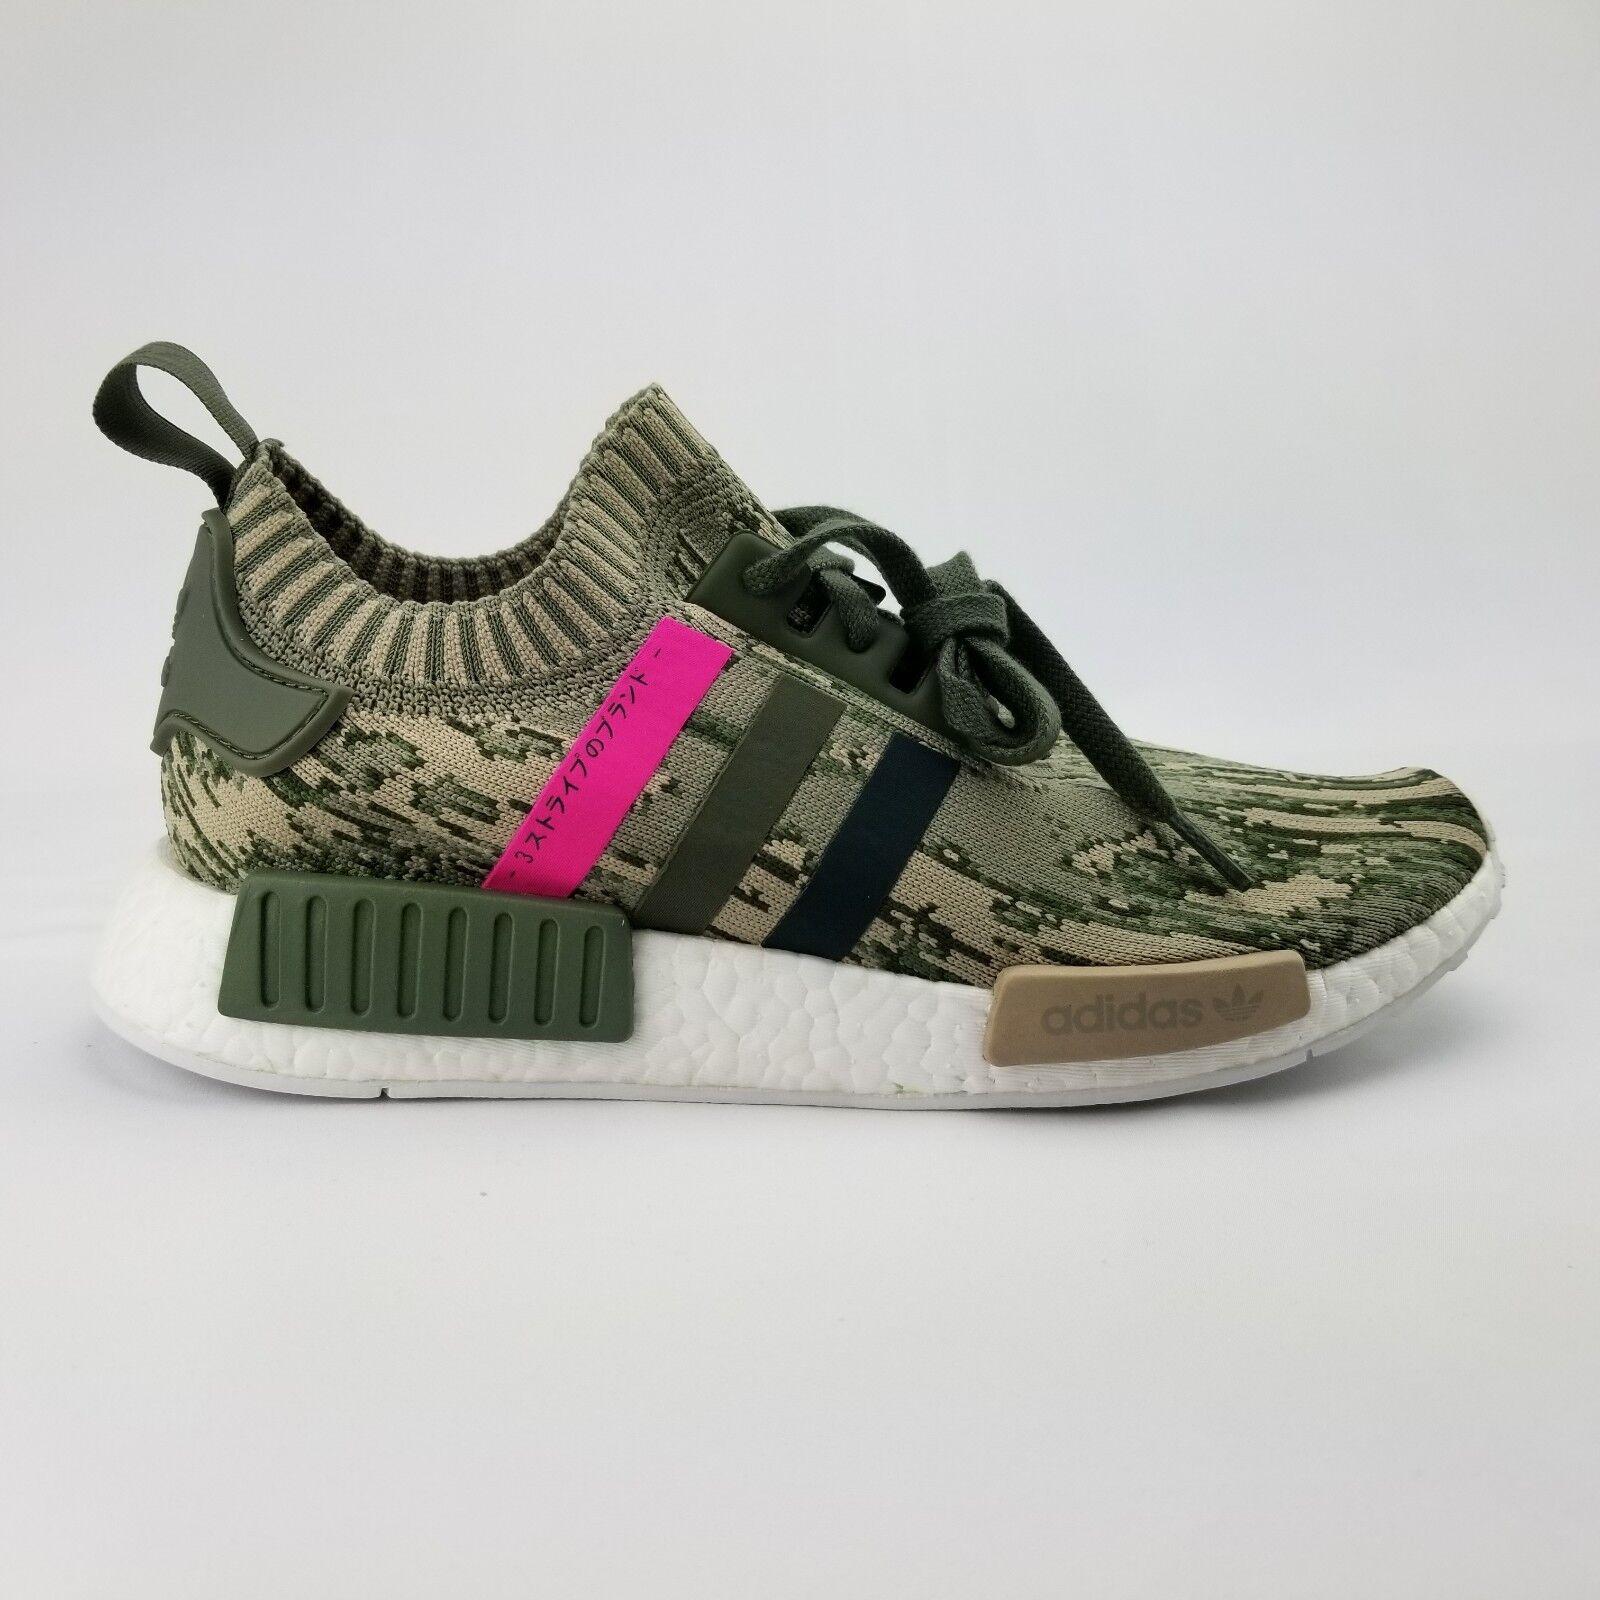 Adidas Primeknit NMD R1 PK Camo BY9864 Japan Green Pink Women's Running shoes 10